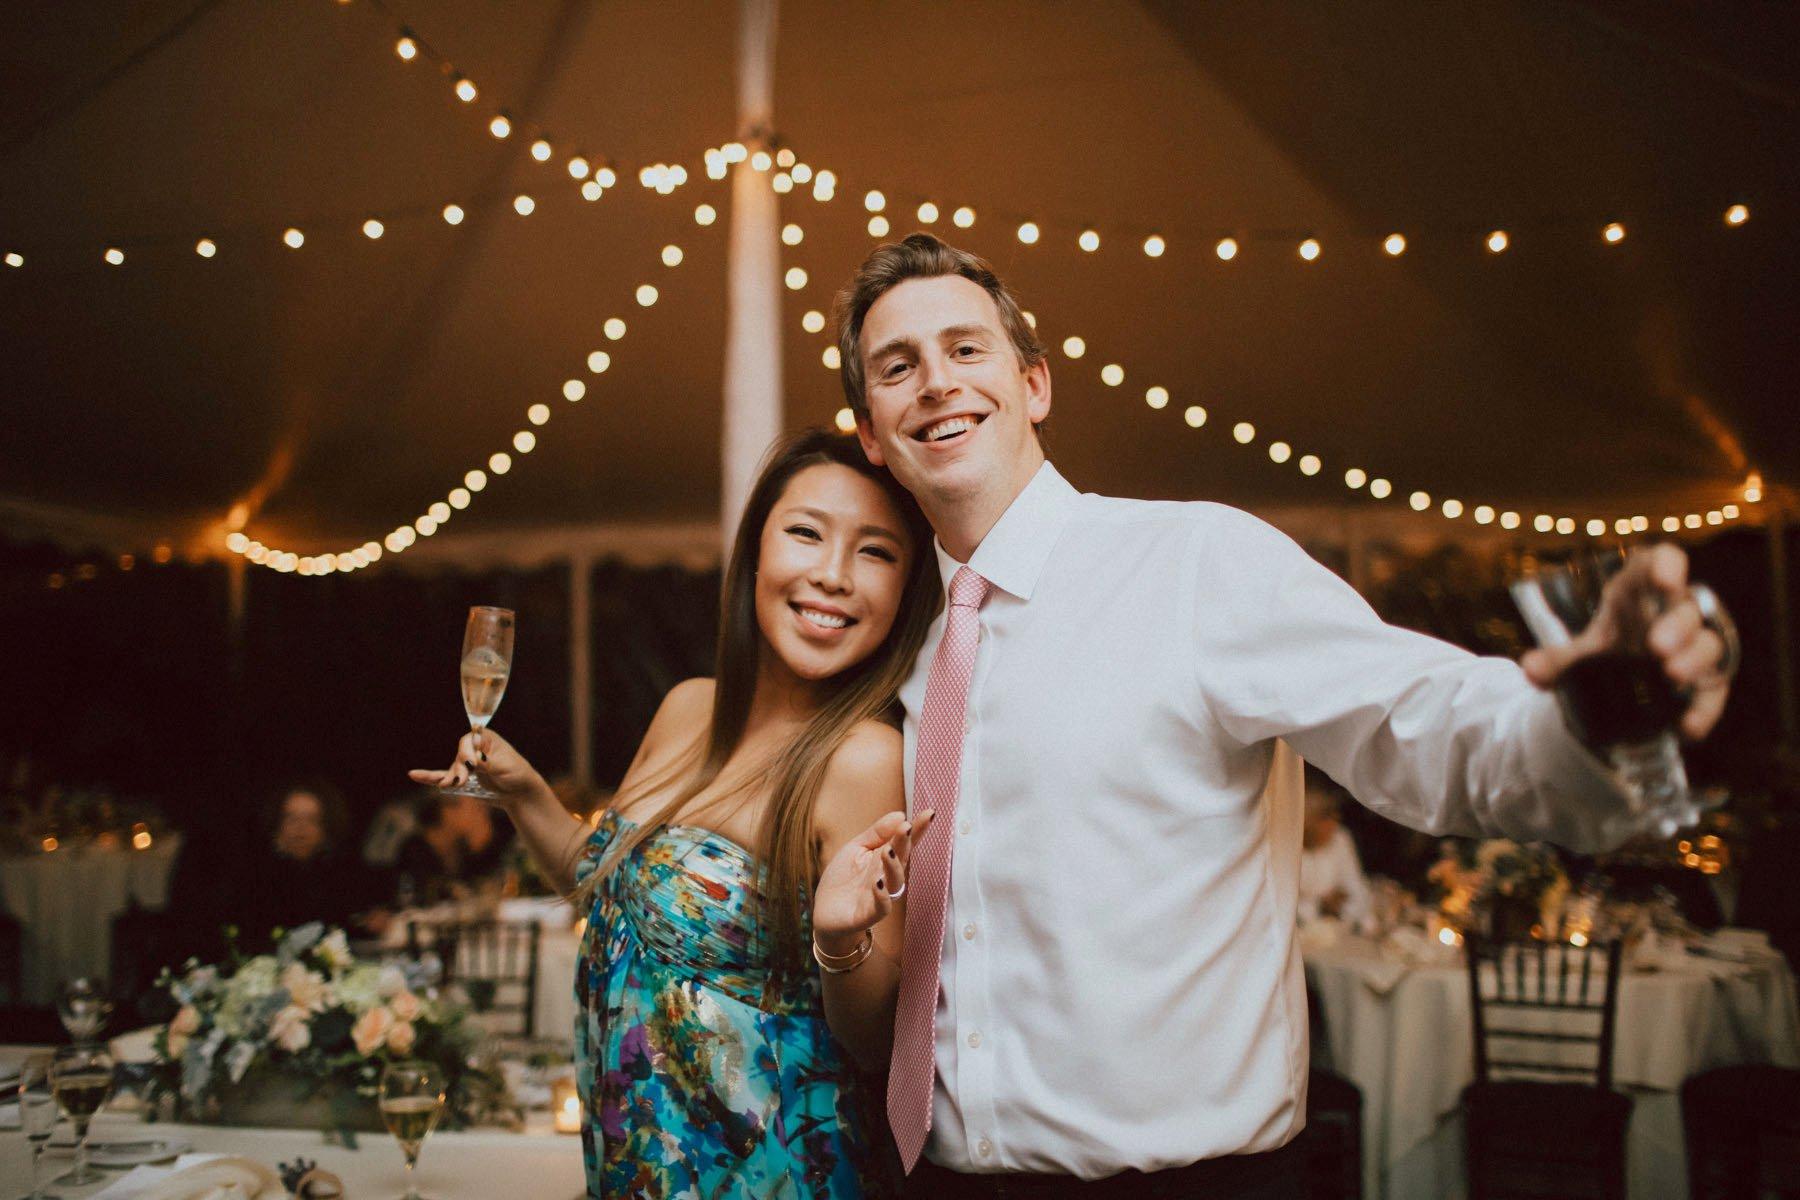 greenville-country-club-wedding-151.jpg